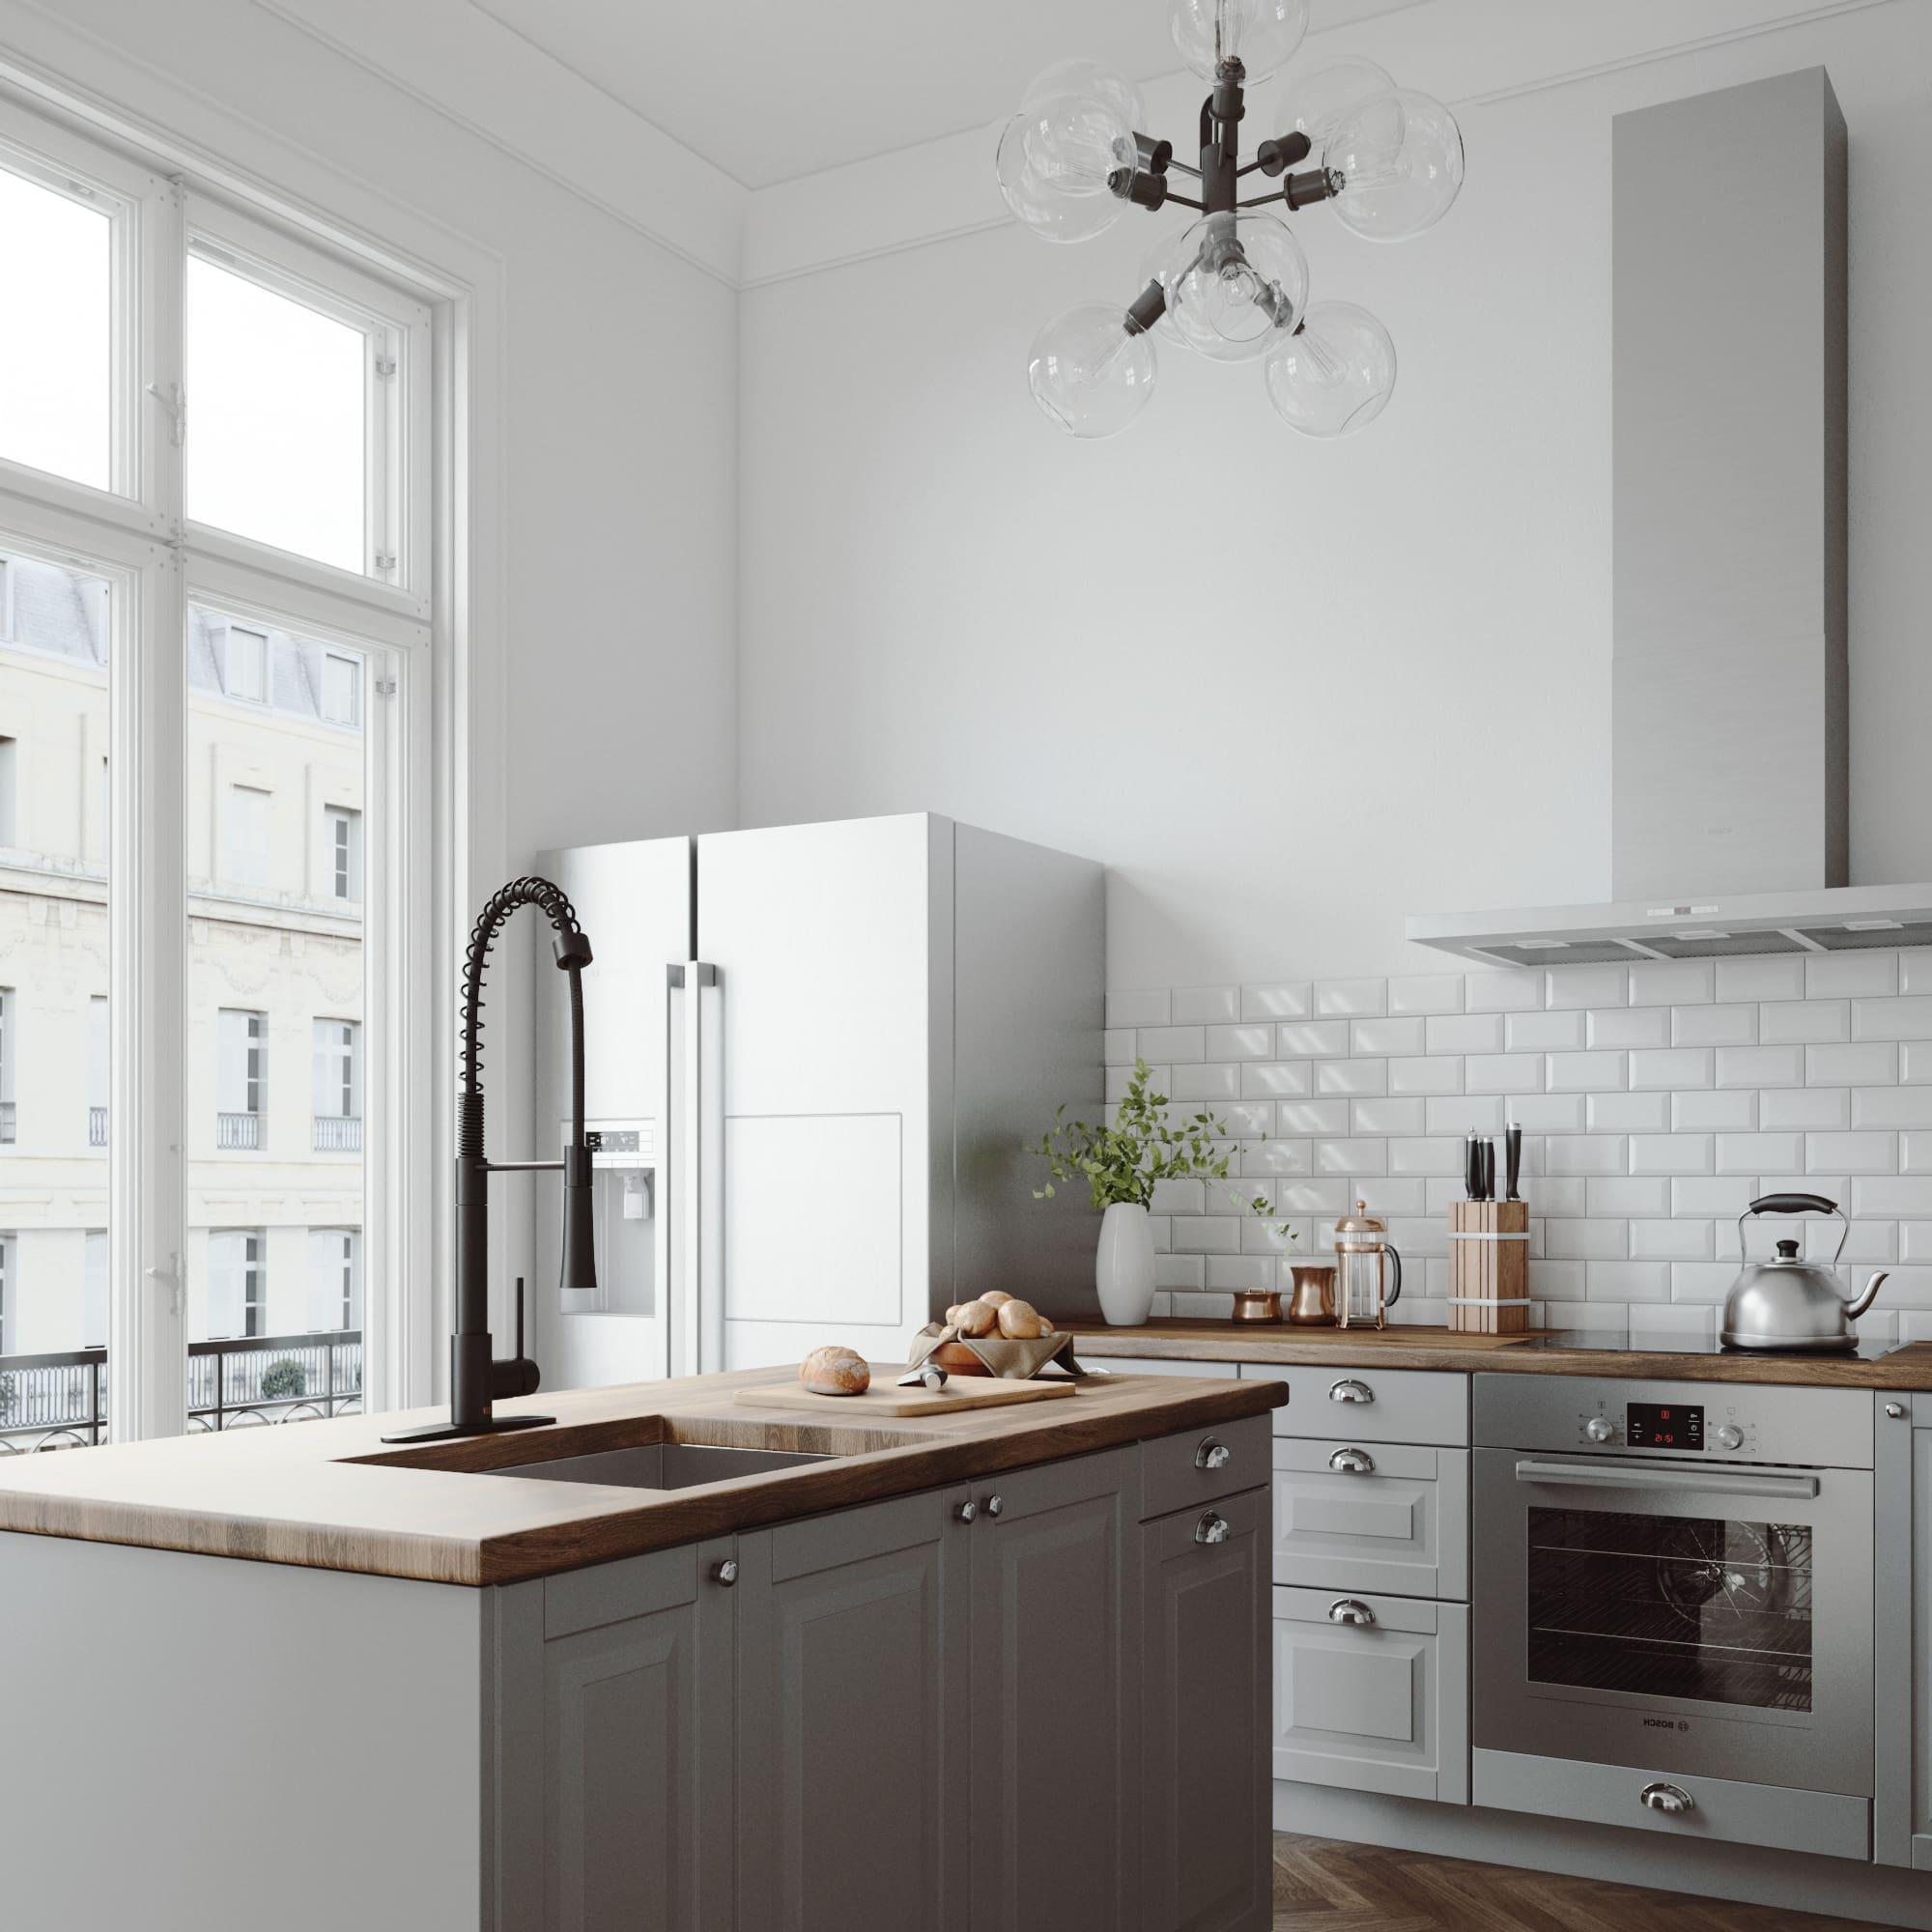 Vigo Laurelton Pull Down Spray Kitchen Faucet In Matte Black vigo vg02022k1 - build